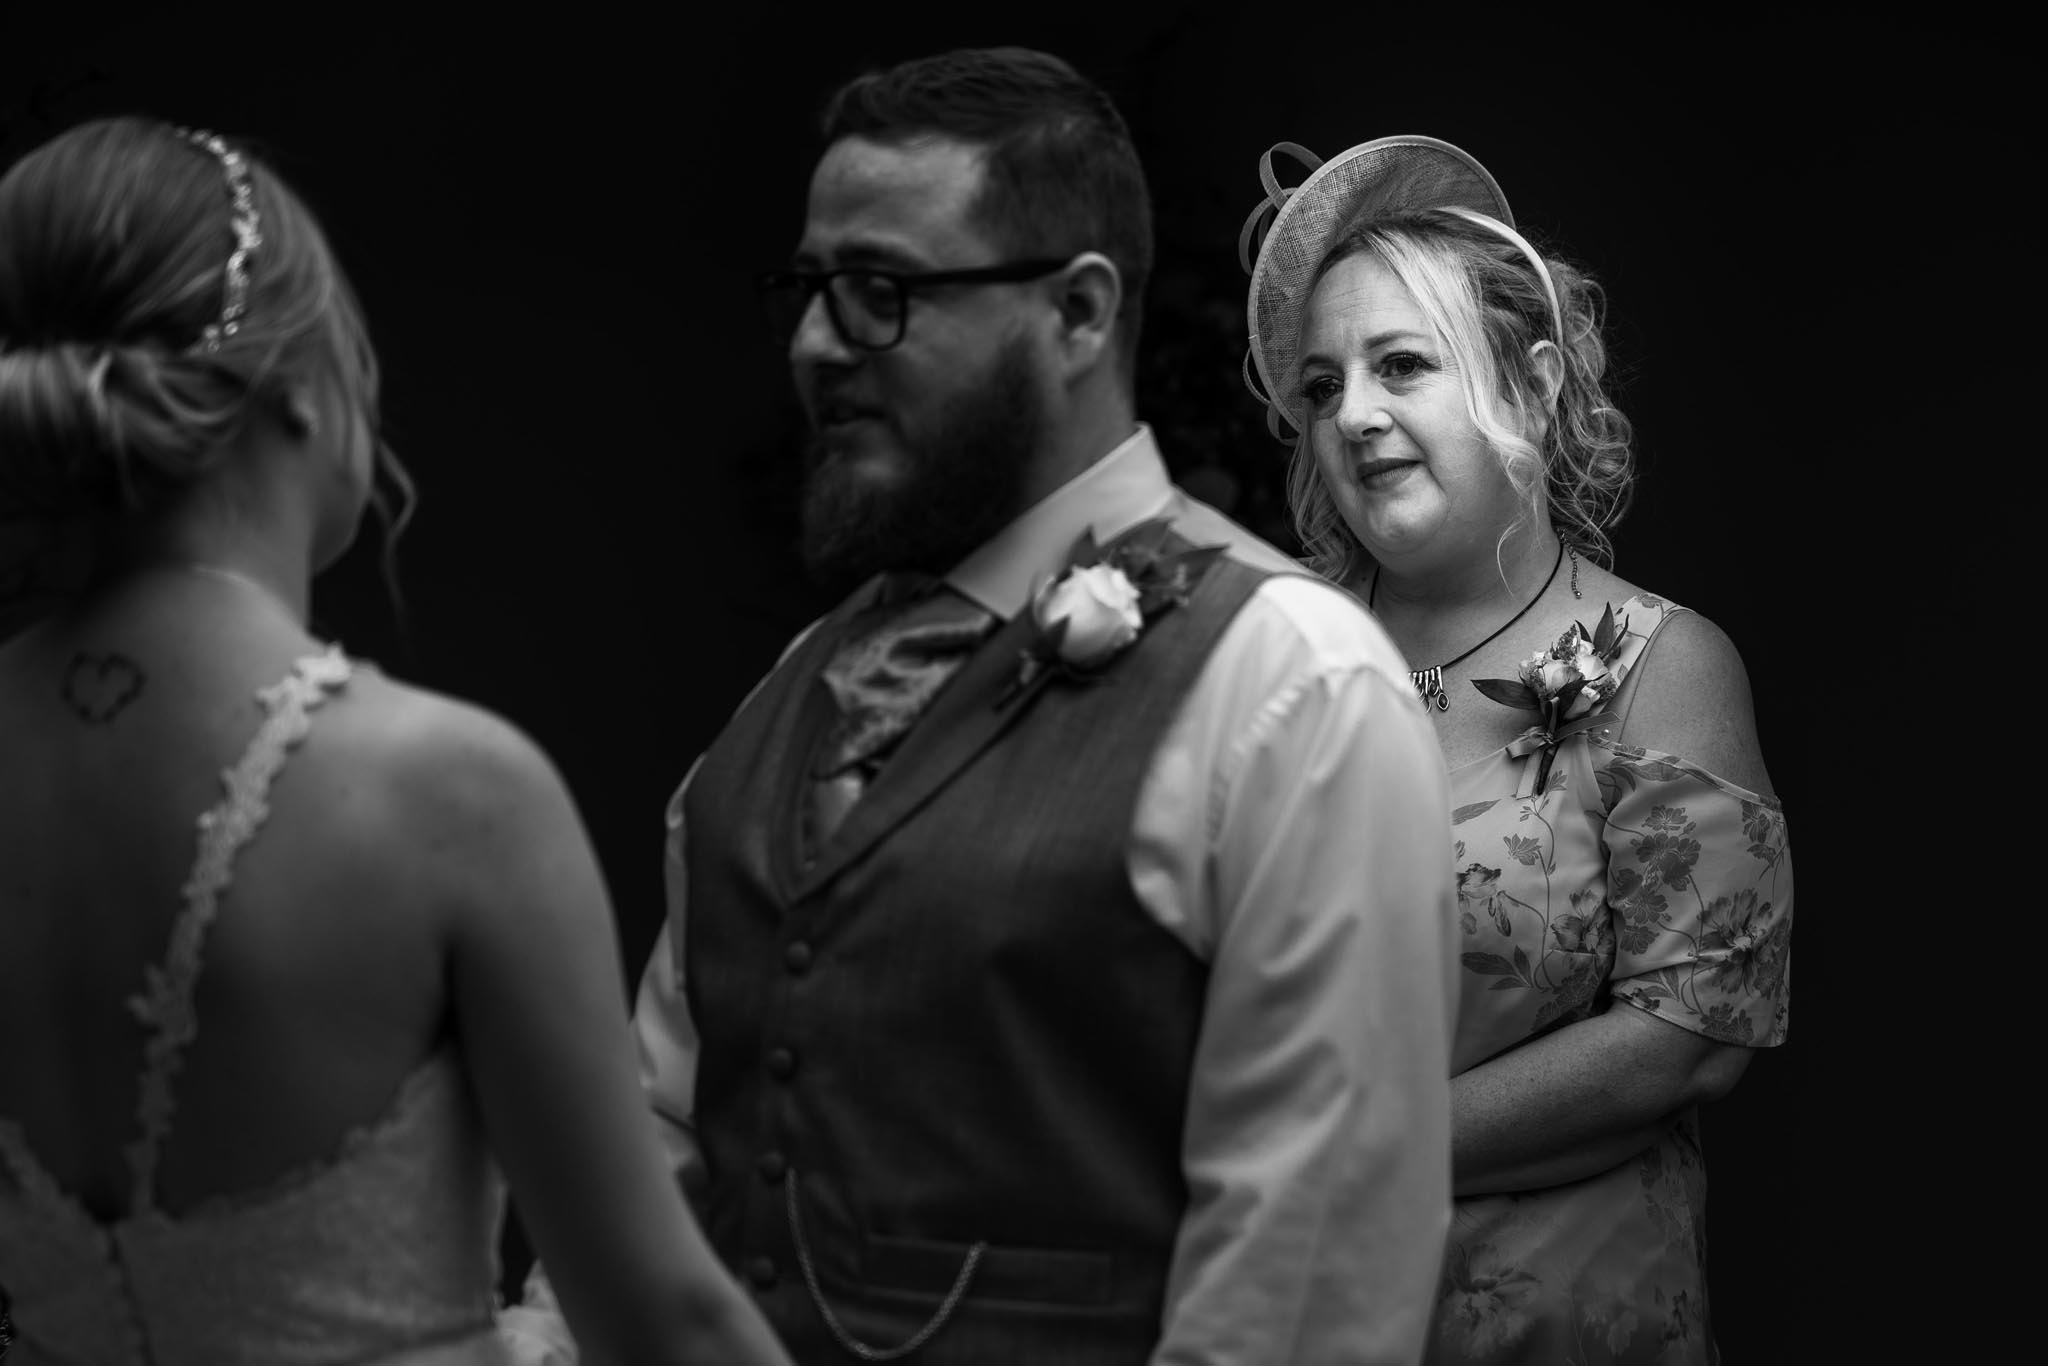 345-Ceremony-Luke-Yasmin-The-Rayleigh-Club-Wedding-Photography.jpg